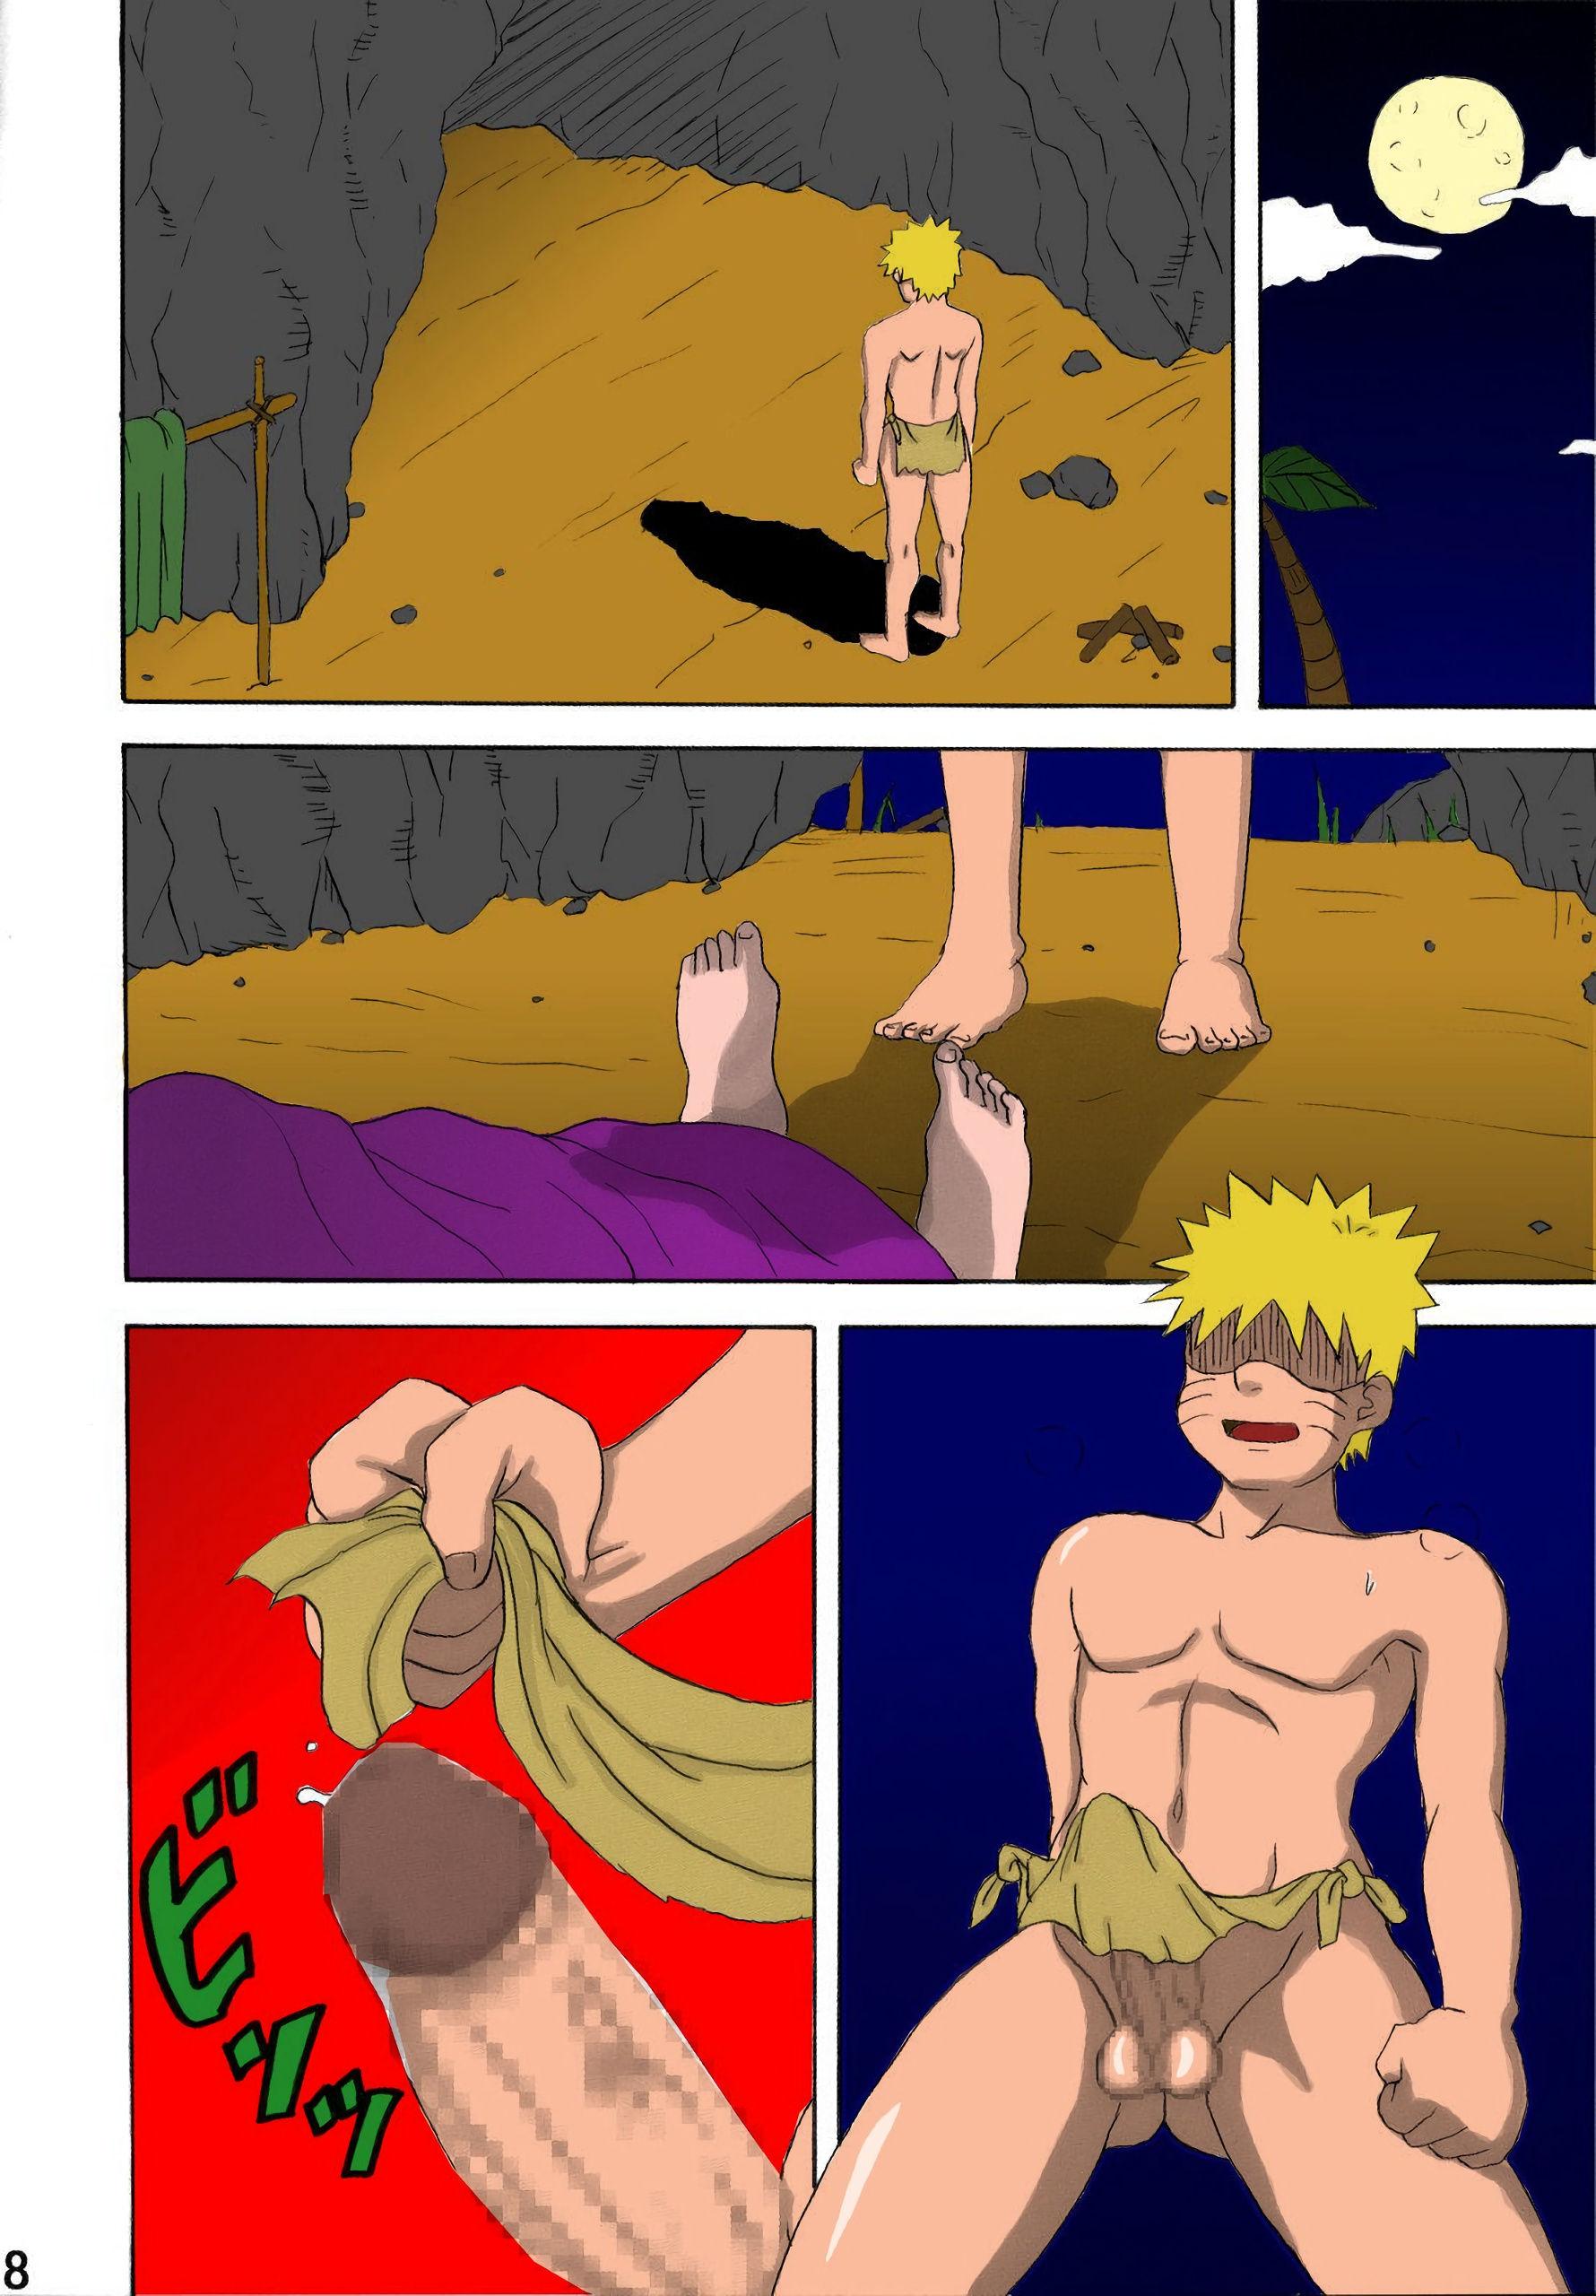 Jungle party hentai manga picture 7